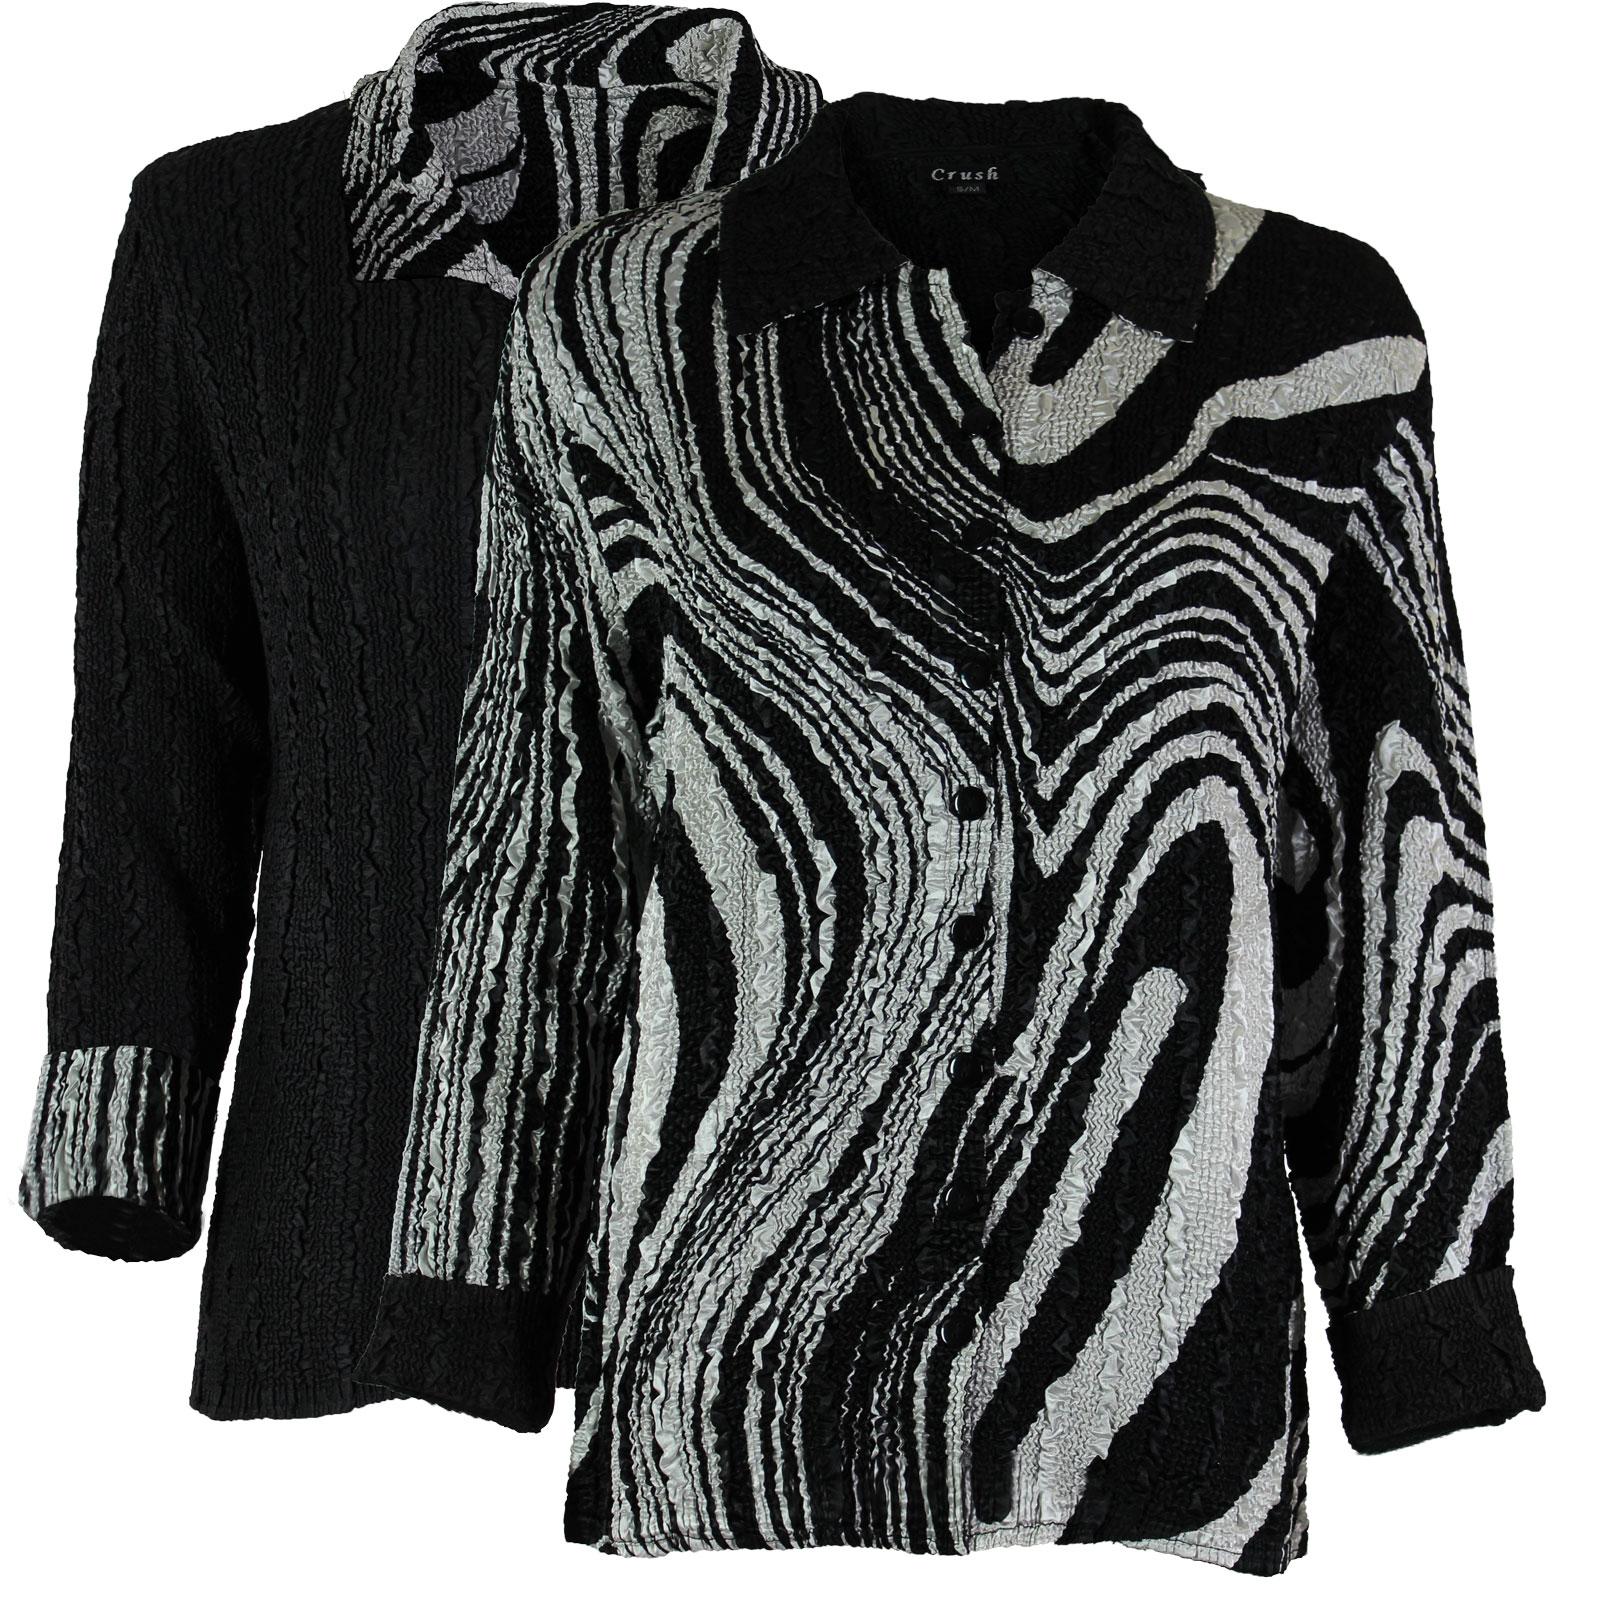 Wholesale Magic Crush - Reversible Jackets #14011 Black and White Swirl - L-XL